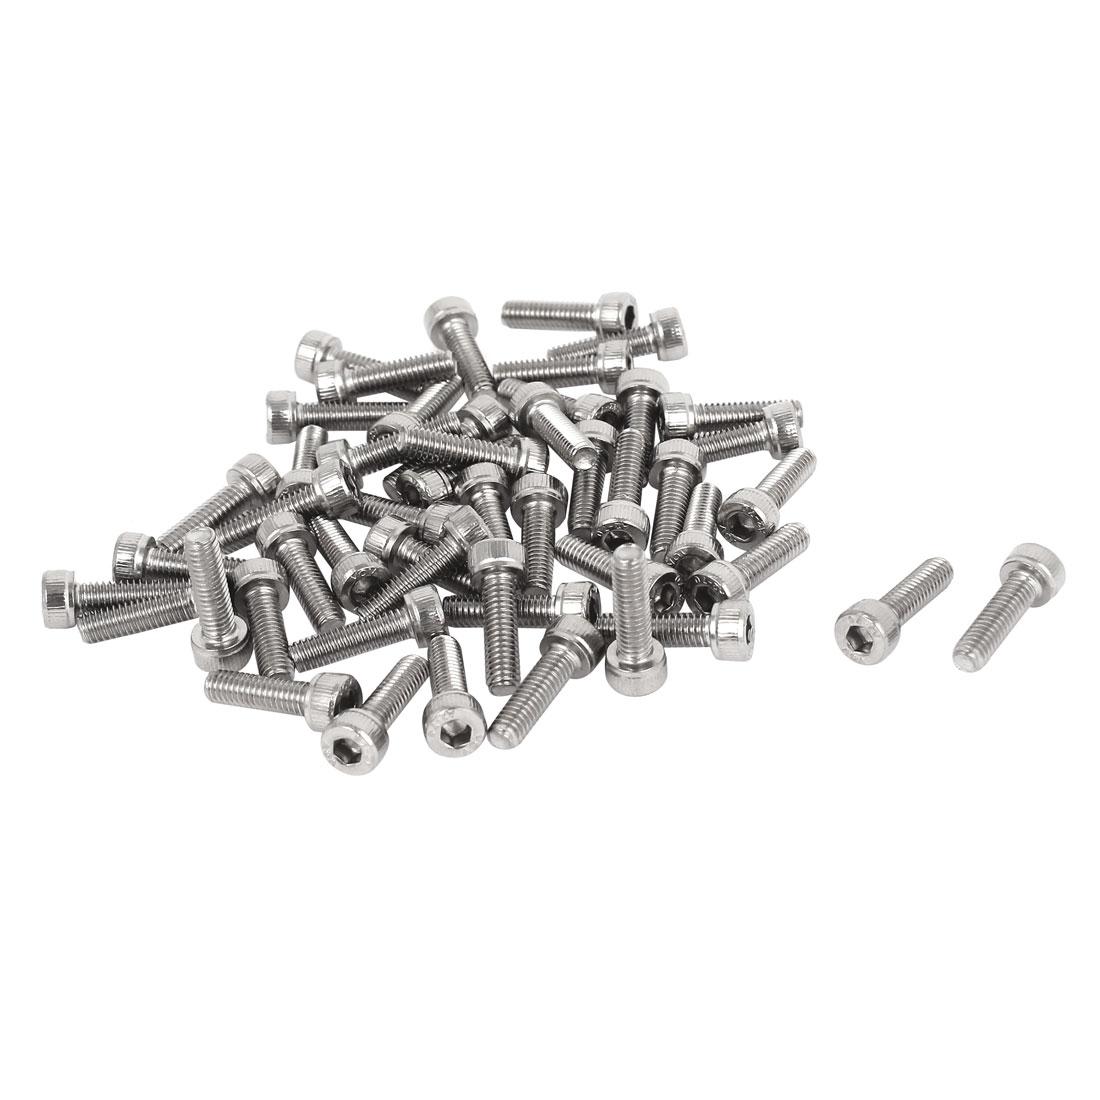 M4x14mm 0.7mm Pitch Stainless Steel Bolts Socket Cap Head Hex Key Screws 50pcs